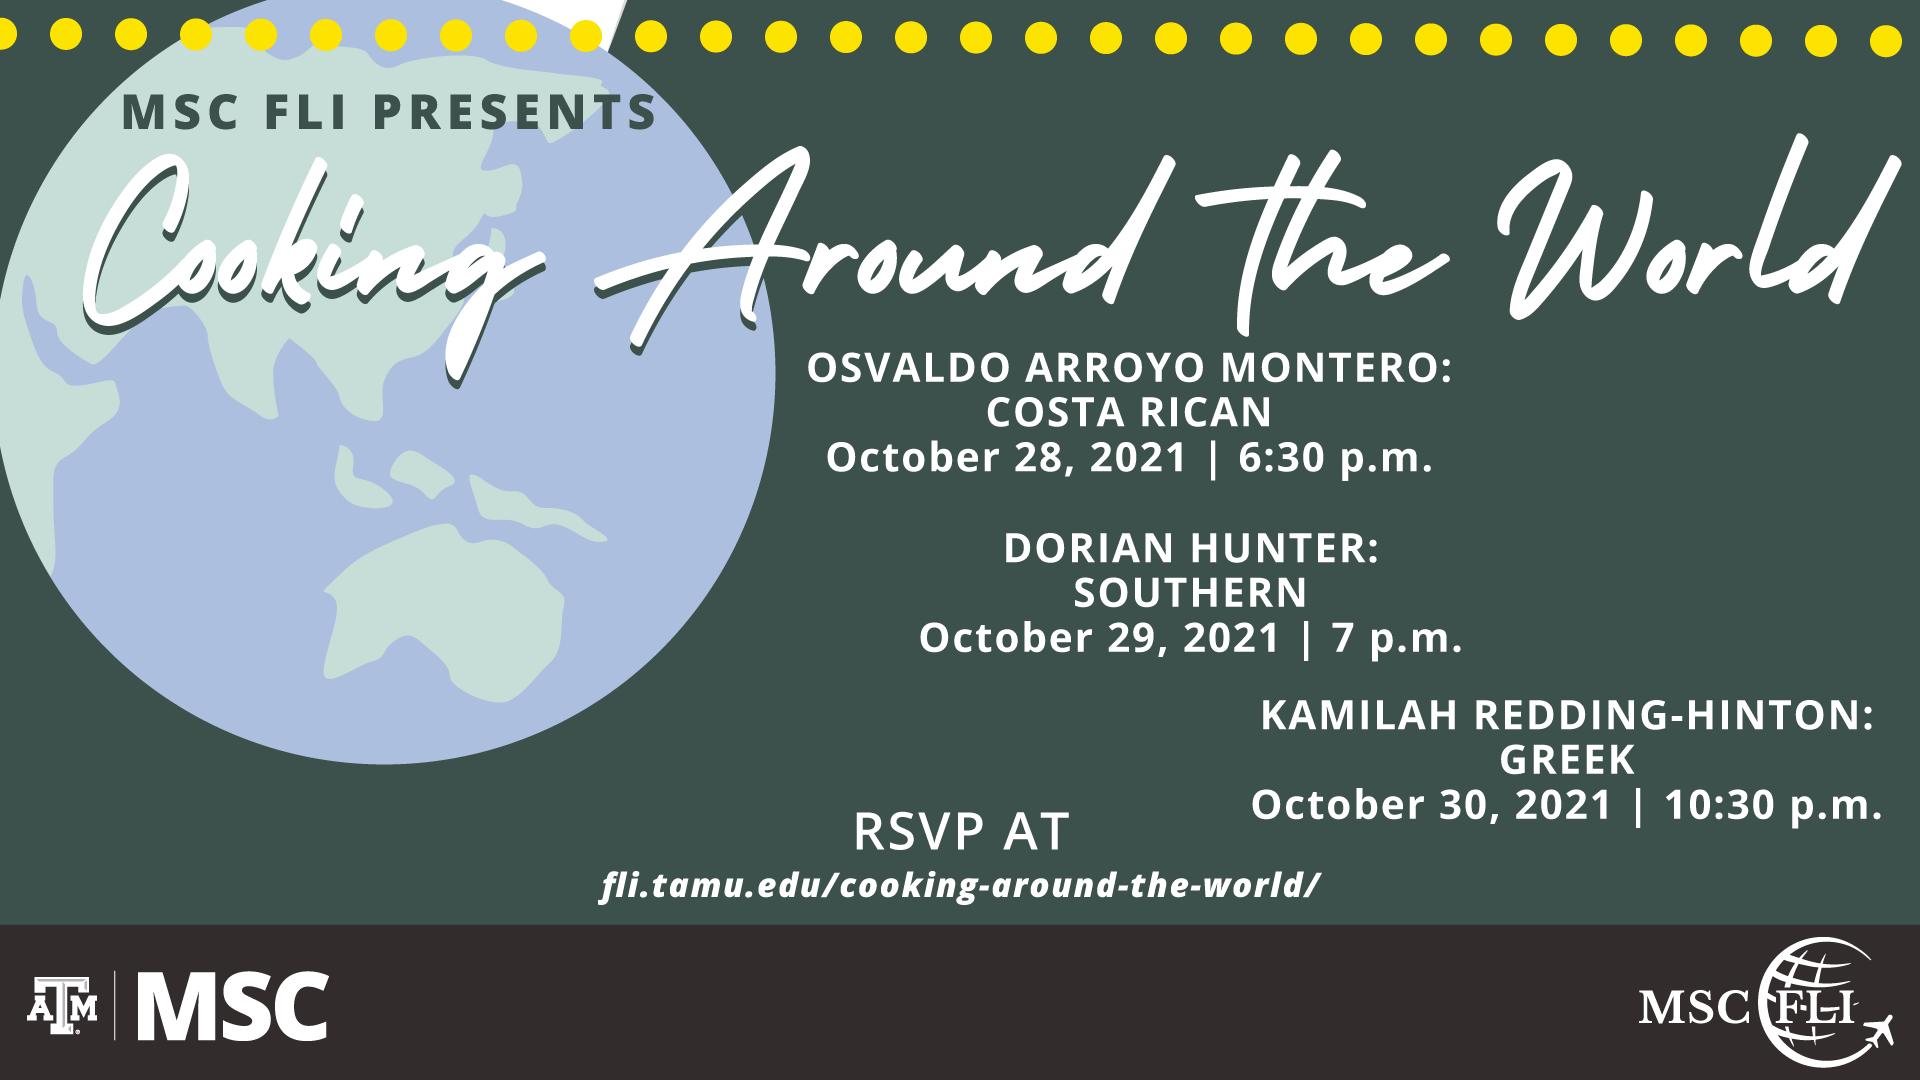 MSC FLI Presents: Cooking Around the World. Osvaldo Arroyo Montero: Costa Rican, October 28, 2021 at 6:30 p.m. Dorian Hunter: Southern, October 29, 2021 at 7 p.m. Kamilah Redding-Hinton: Greek, October 30, 2021 at 10:30 p.m. RSVP at fli.tamu.edu/cooking-around-the-world/